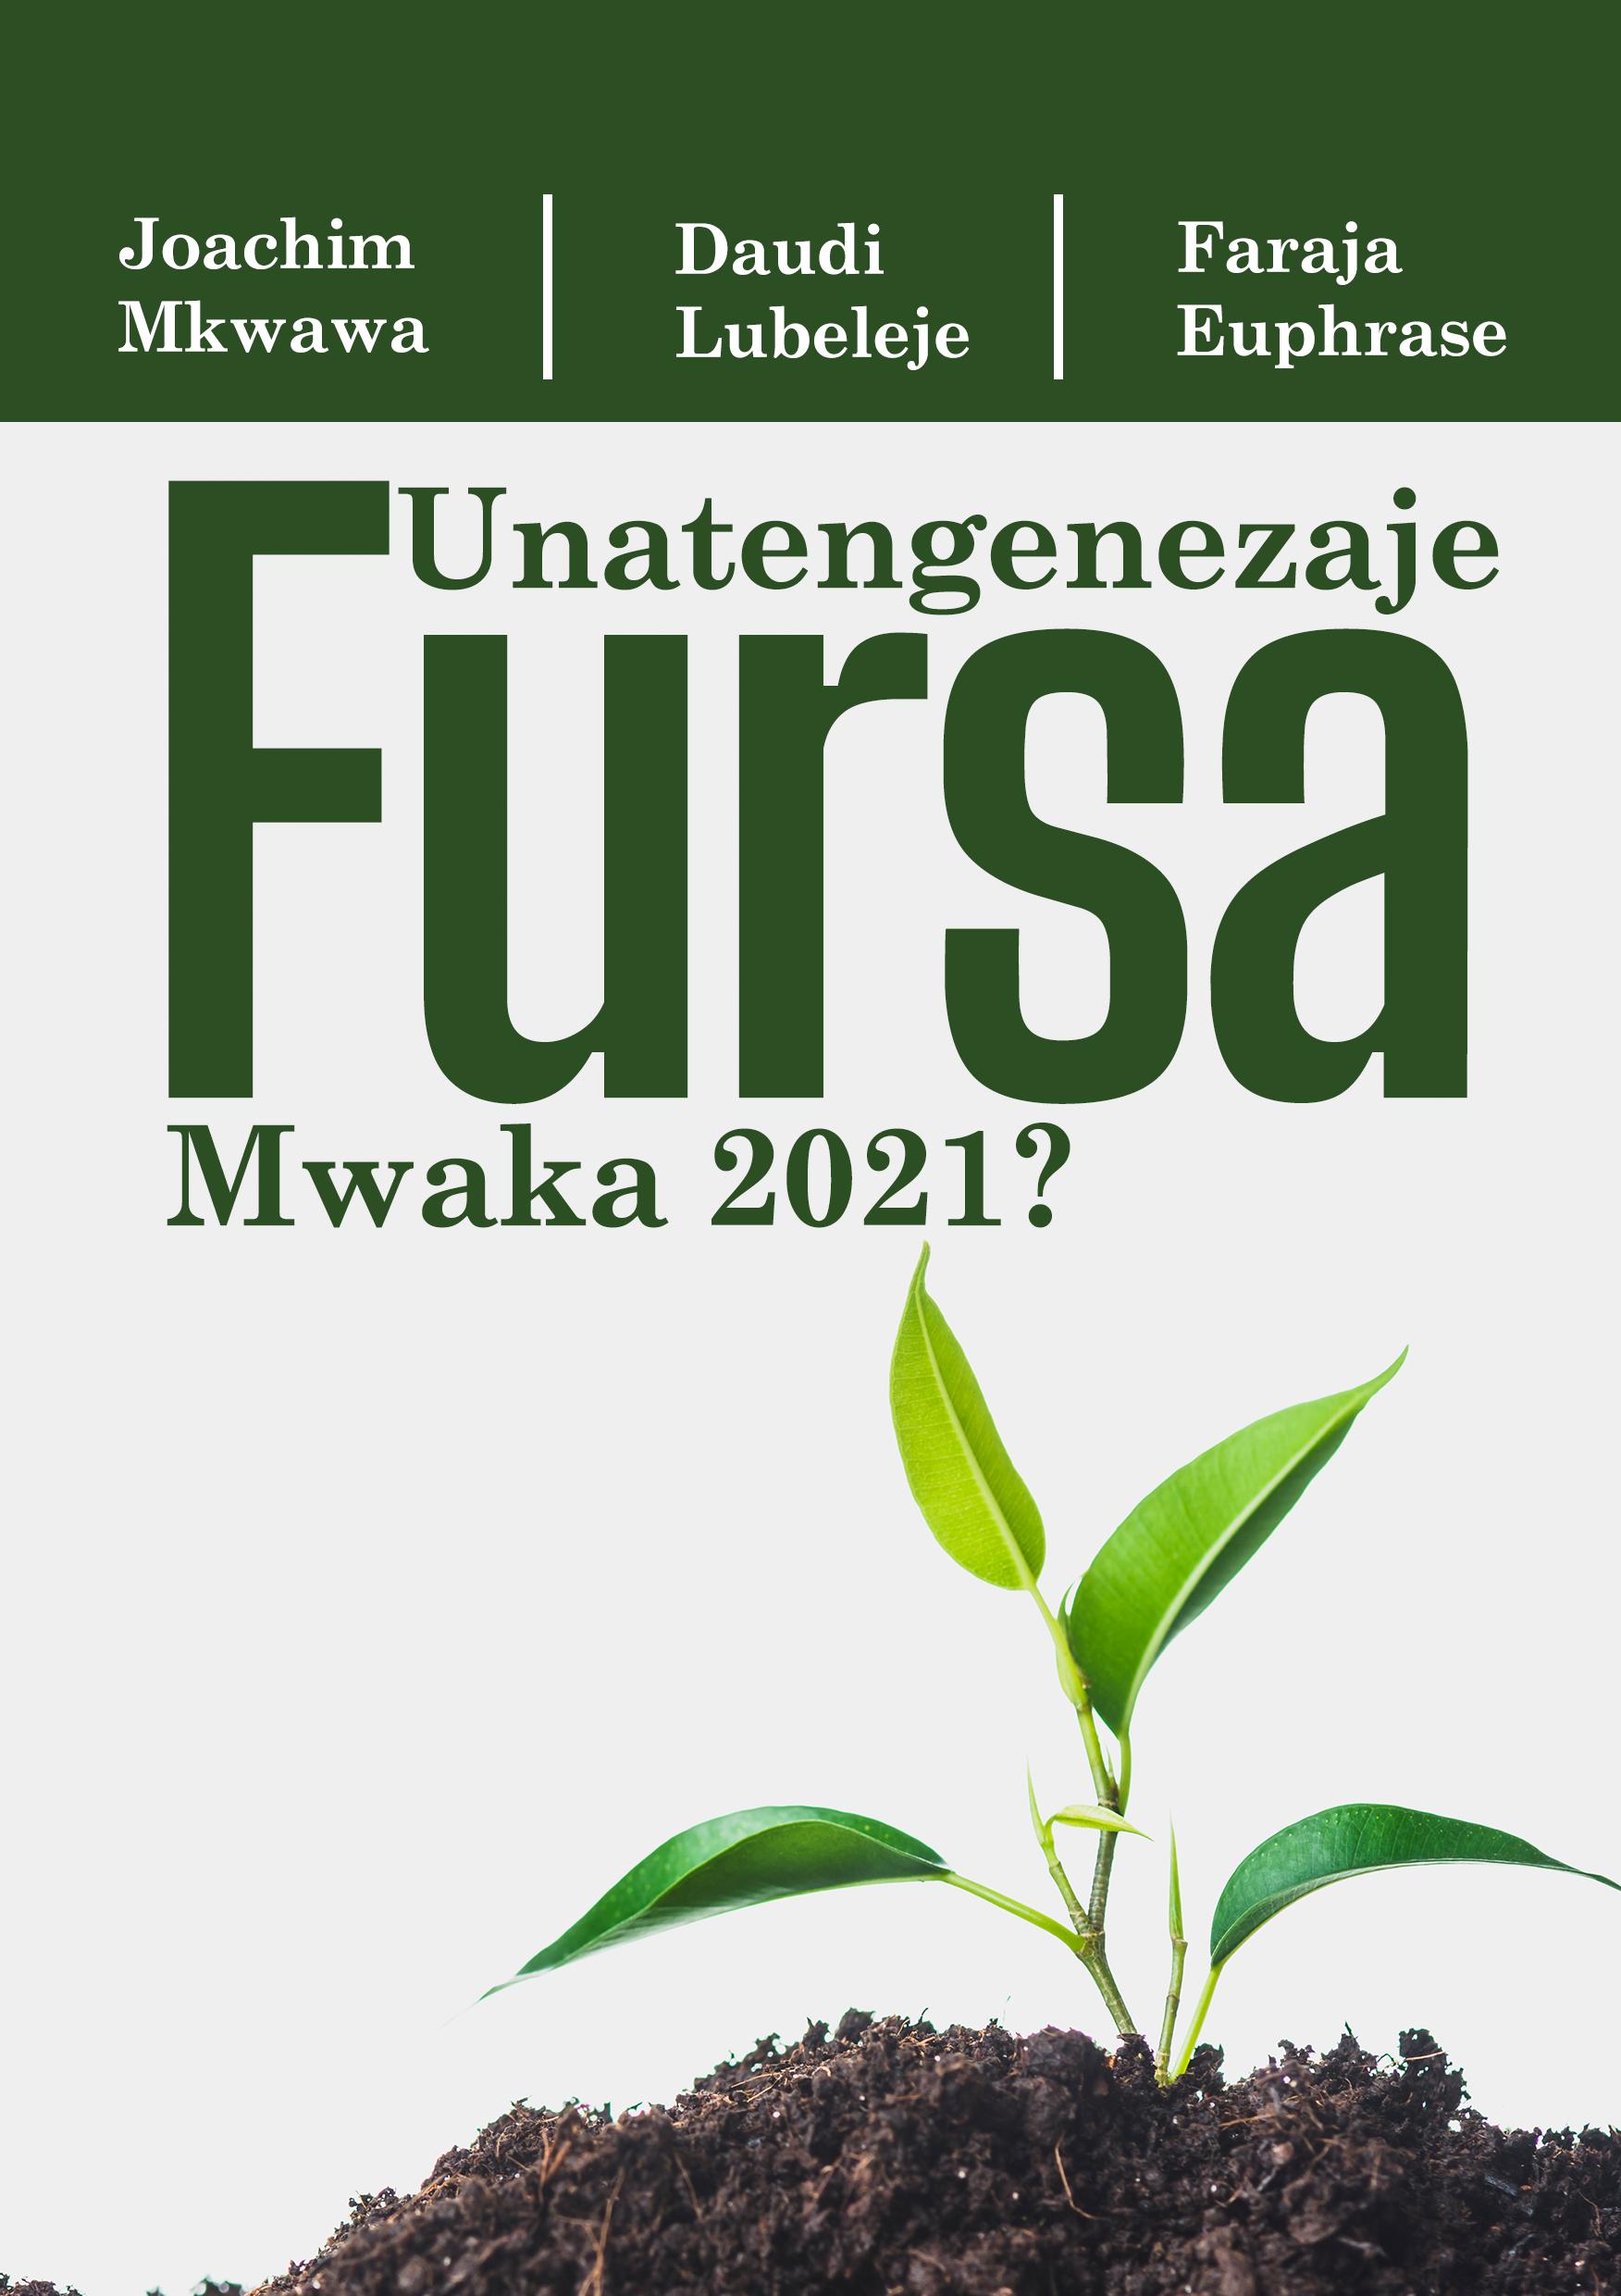 UNATENGENEZAJE FURSA MWAKA 2021?